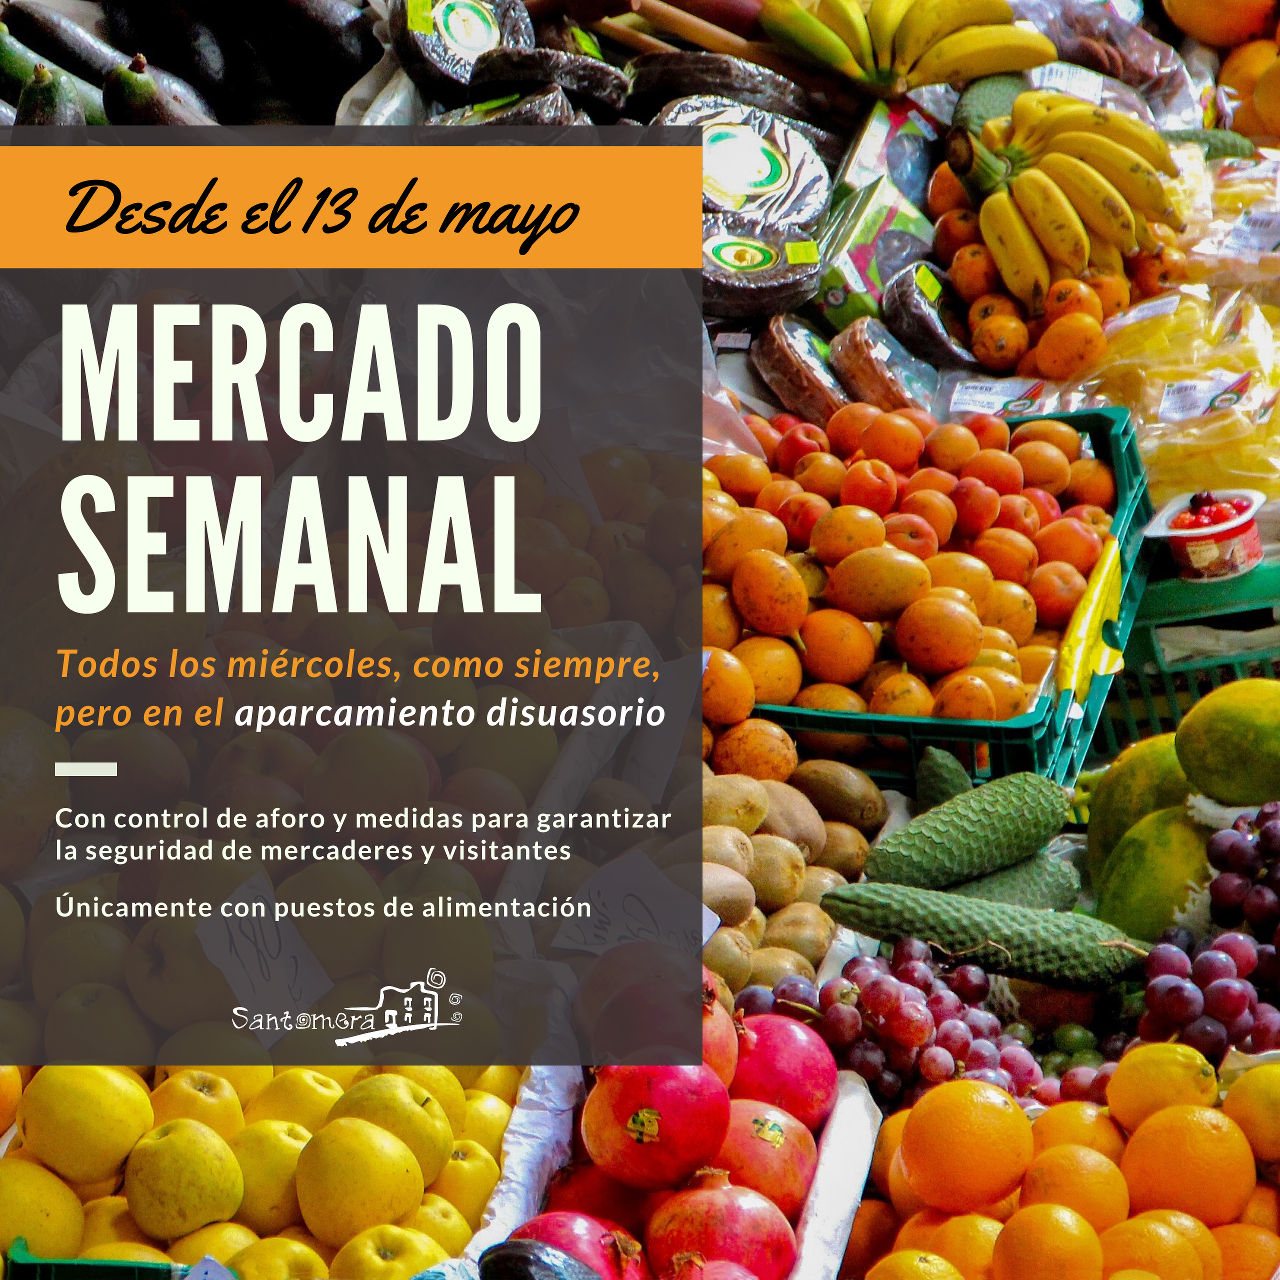 20200512_Mercado semanal